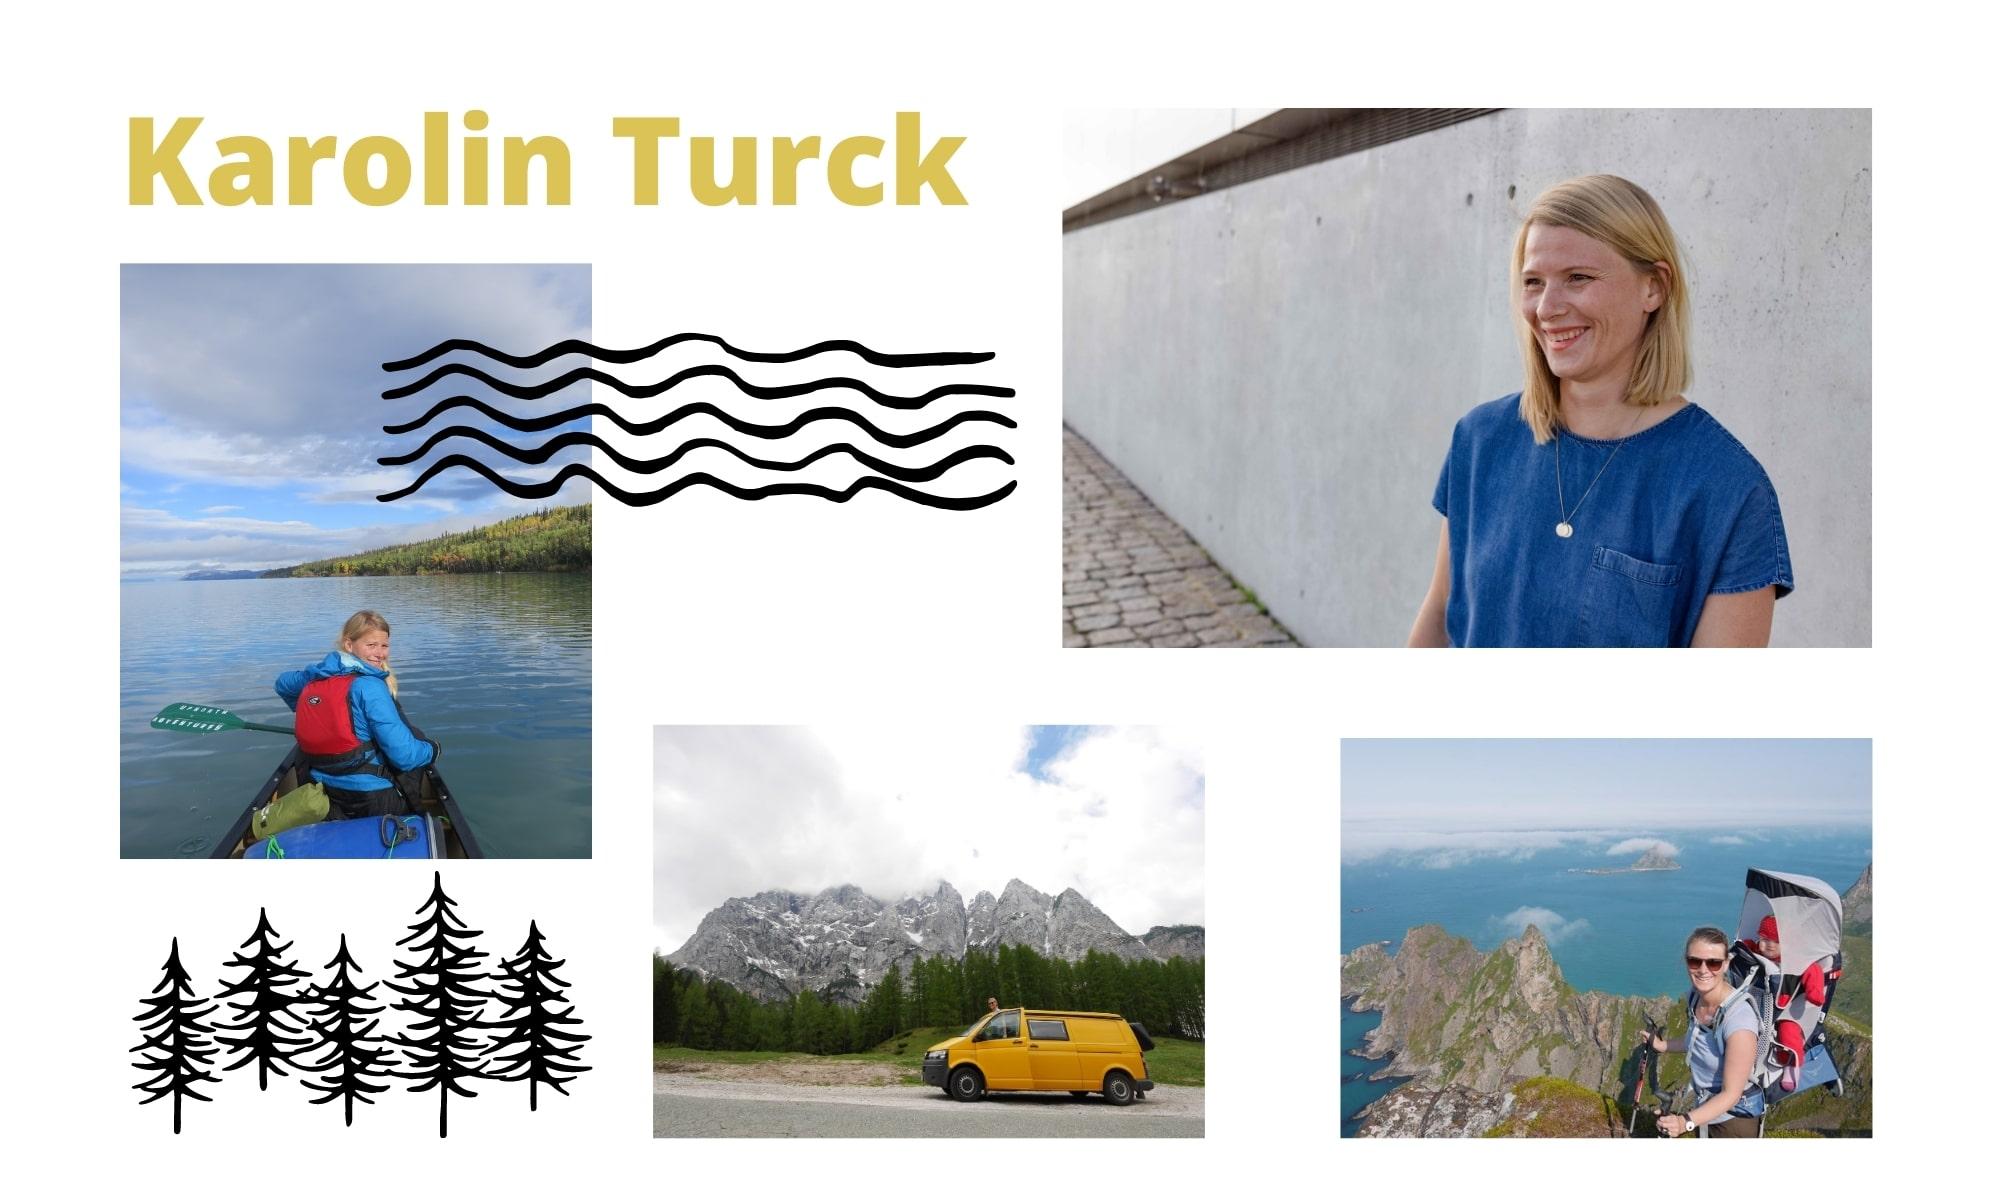 Karolin Turck von der Camp Komm Kommunikationsberatung